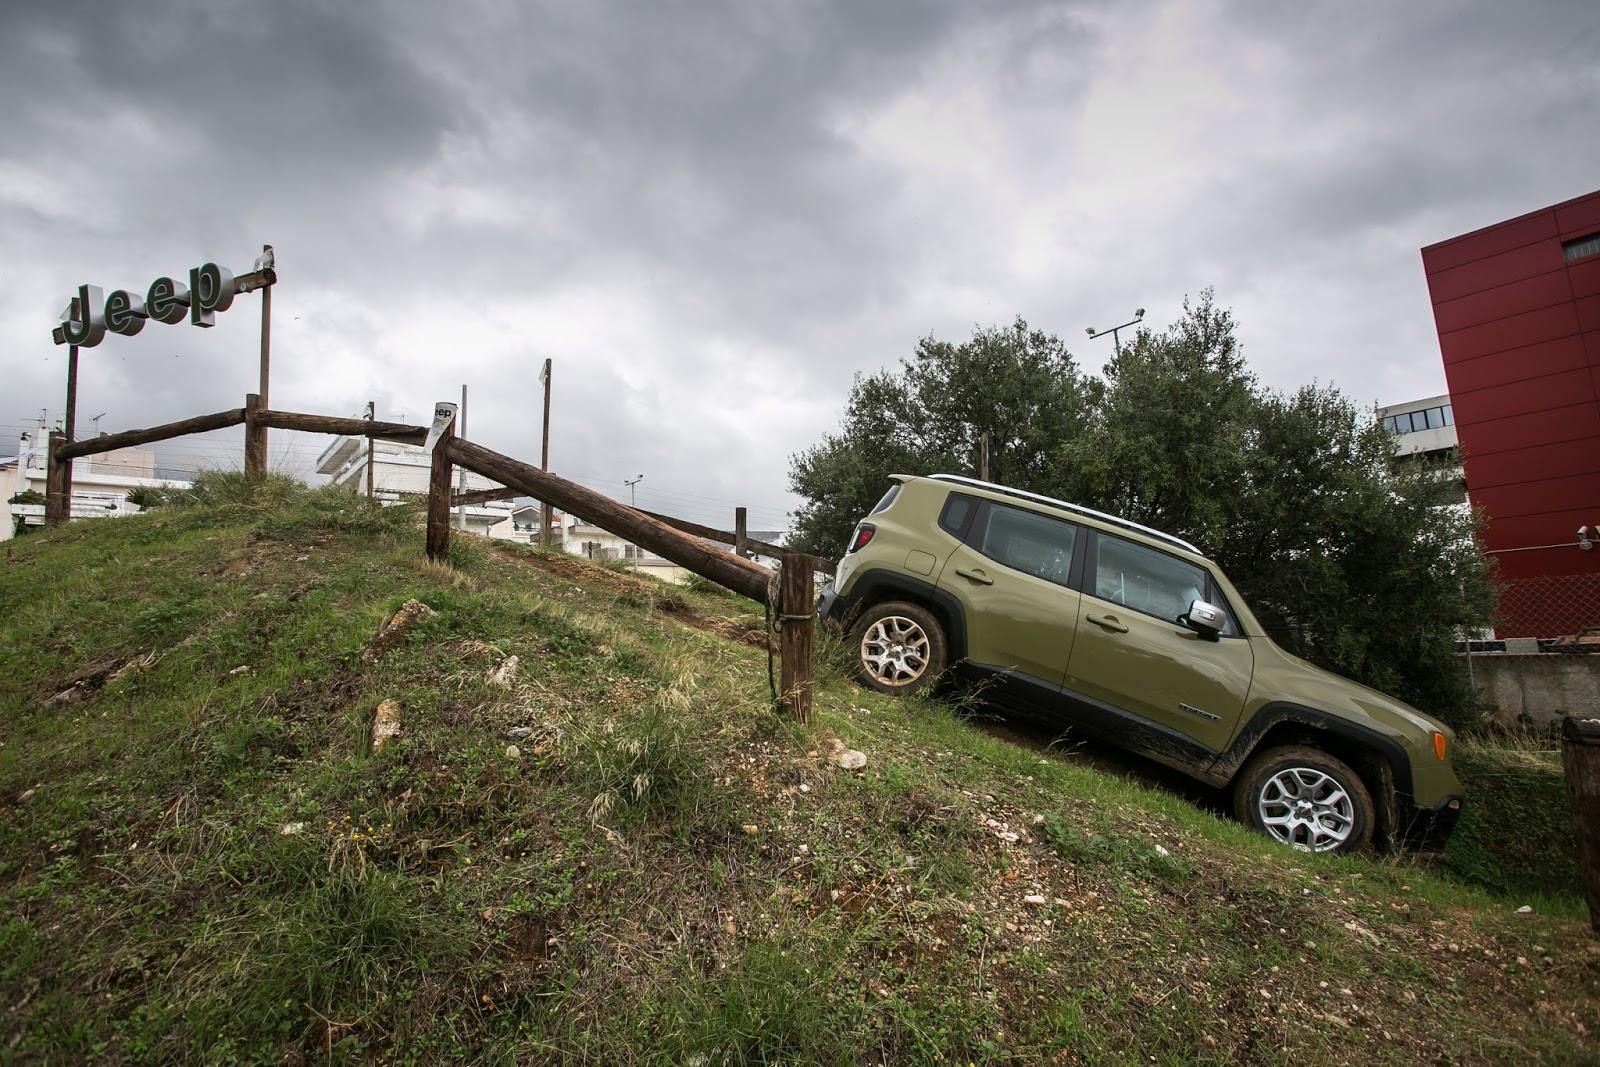 JEEP%2BCAMP GK 0399 Πετάμε ένα Jeep Renegade σε λάσπες, πέτρες, άμμο, λίμνες. Θα τα καταφέρει; Jeep, Jeep Renegade, Renegade, SUV, TEST, zblog, ΔΟΚΙΜΕΣ